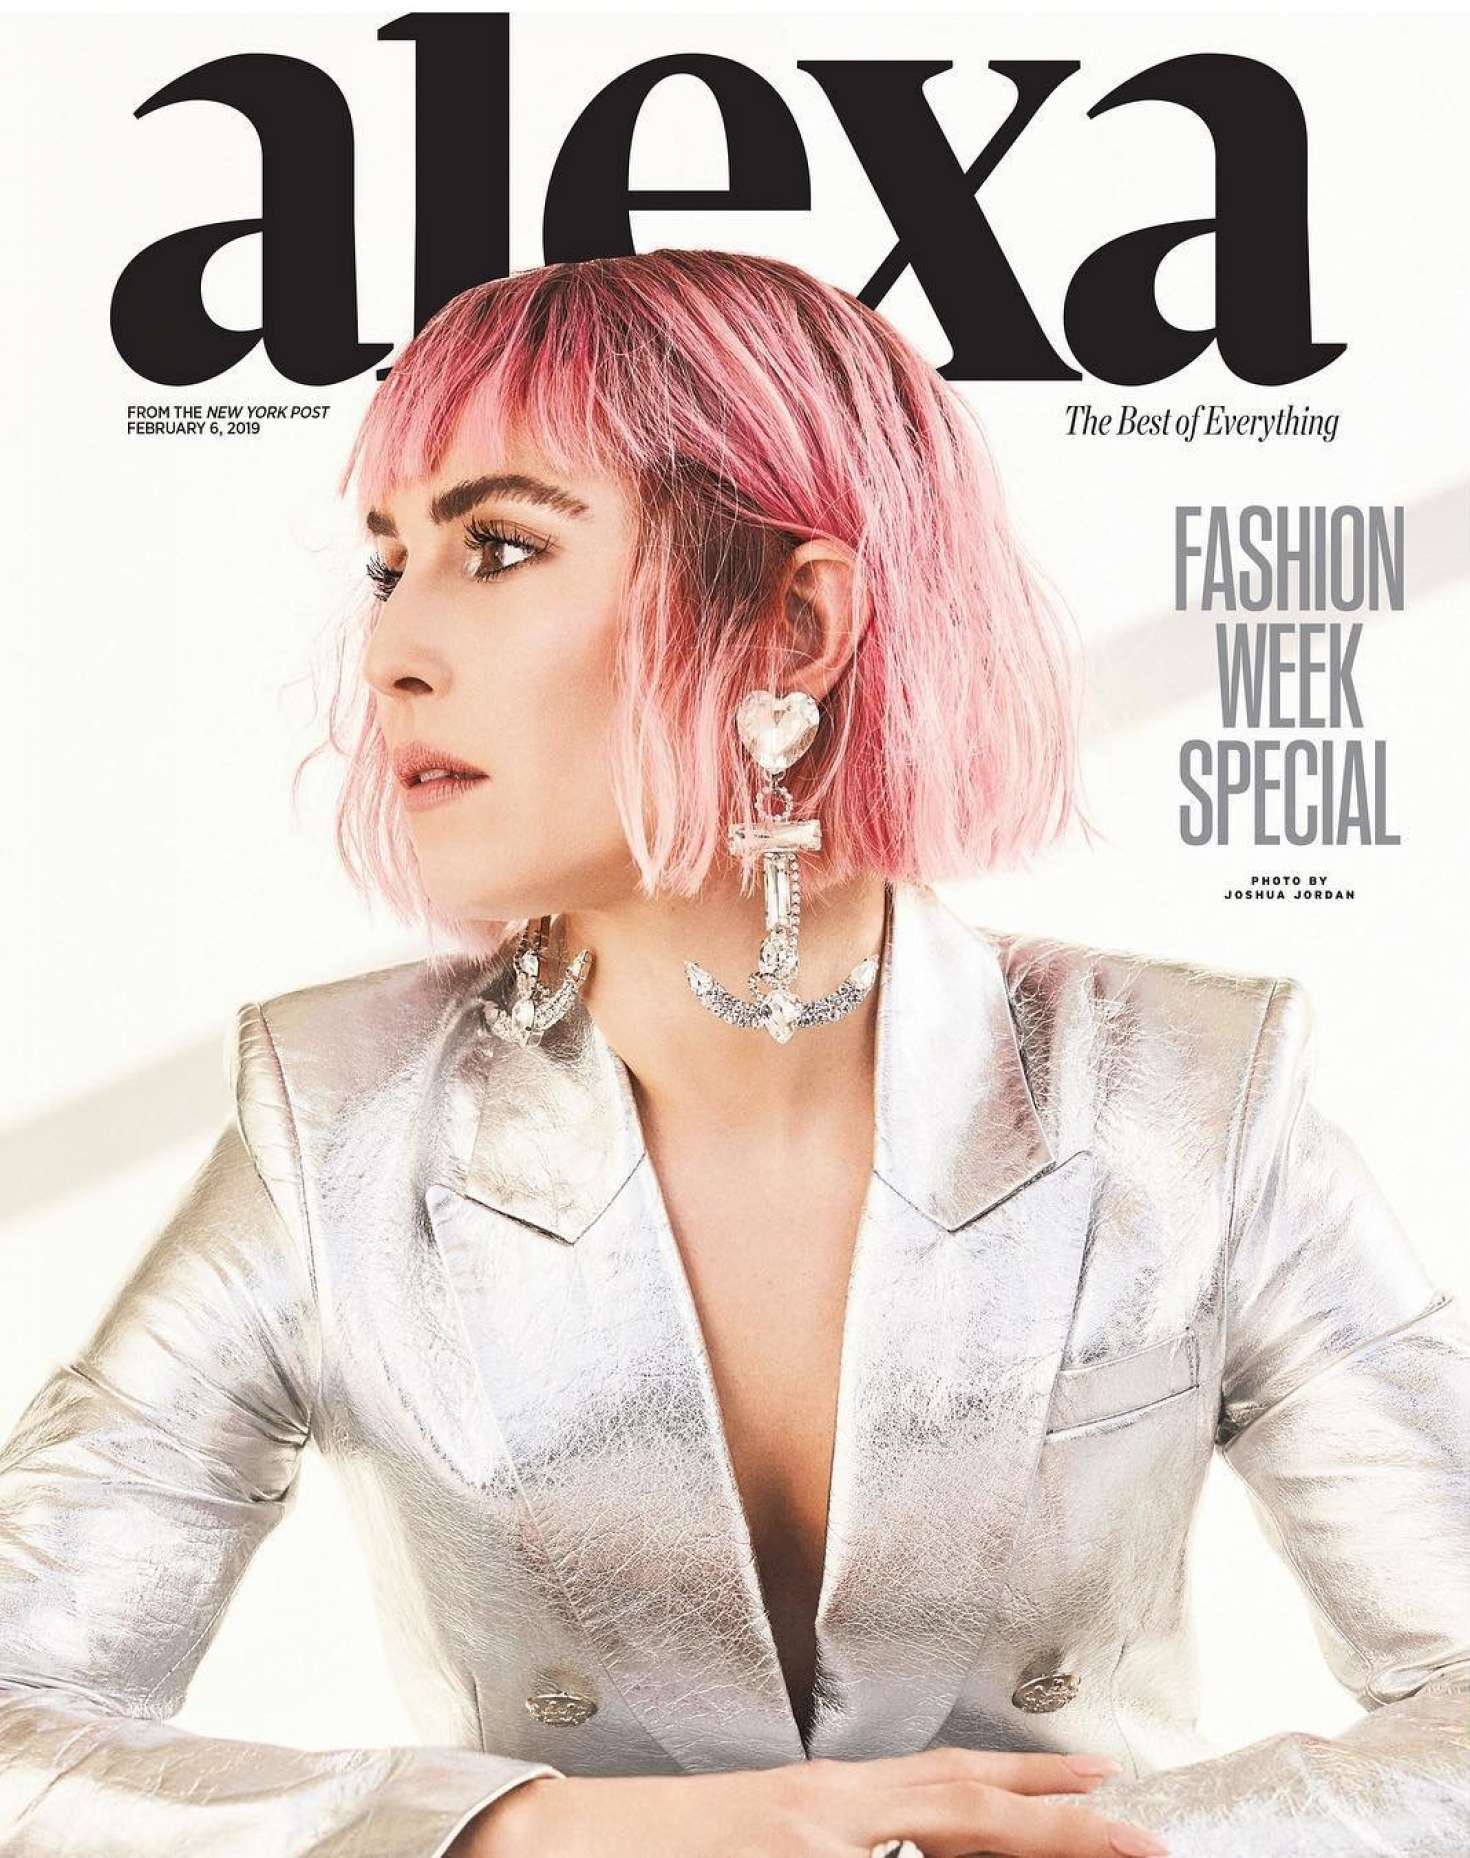 Noomi Rapace 2019 : Noomi Rapace: Alexa New York Post 2019 -07